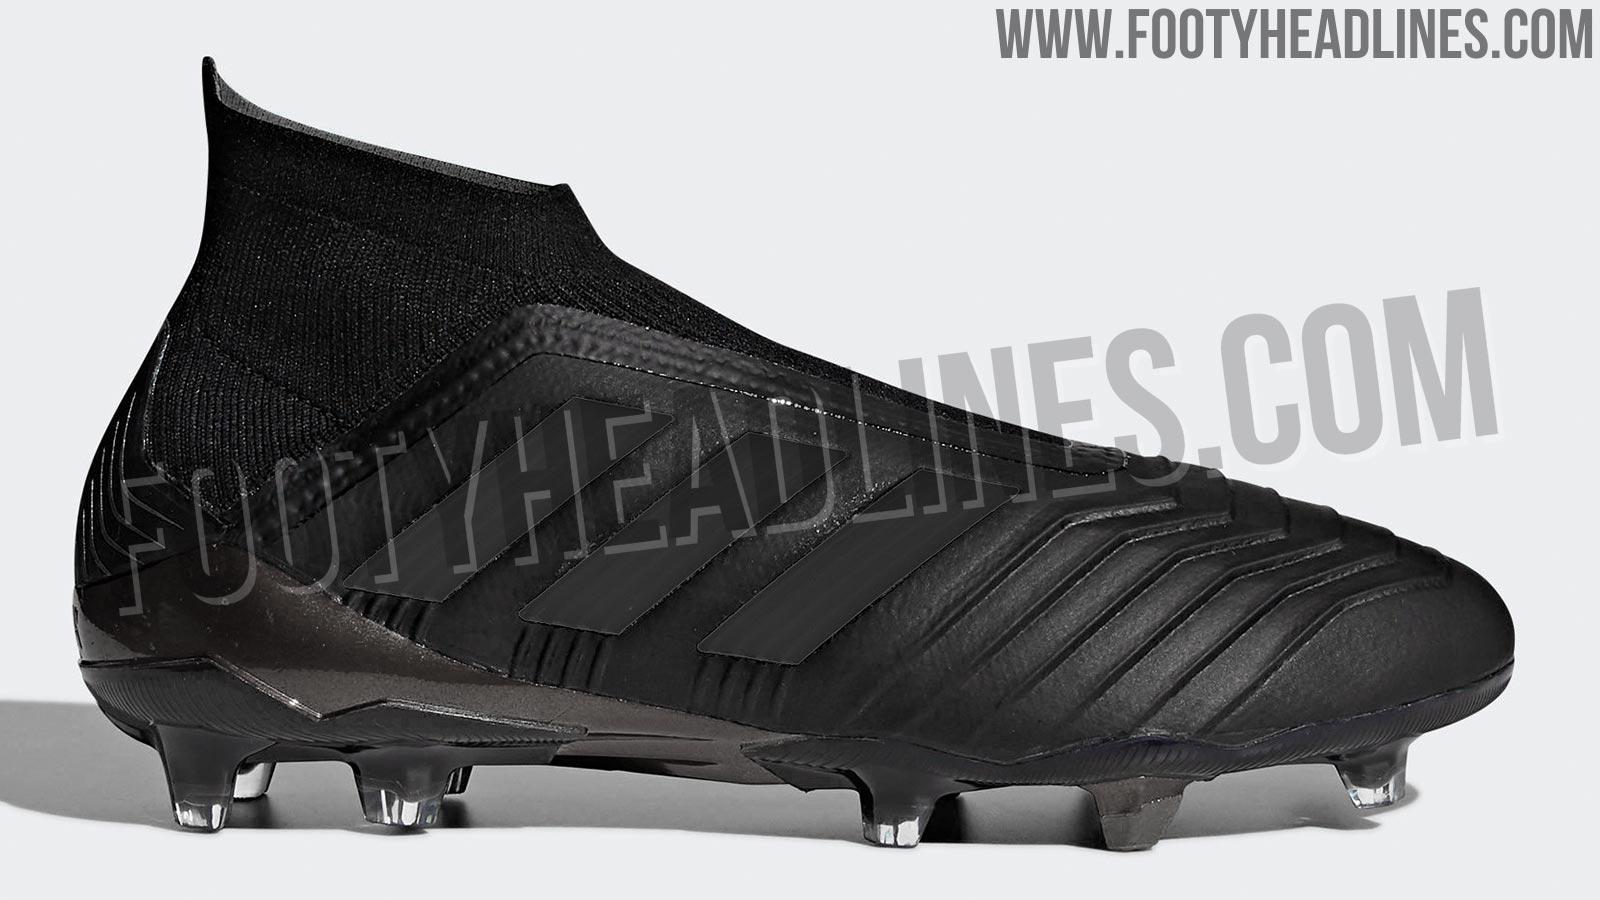 088ae7116 This image shows the Adidas Predator Nitecrawler 2018 soccer boot.